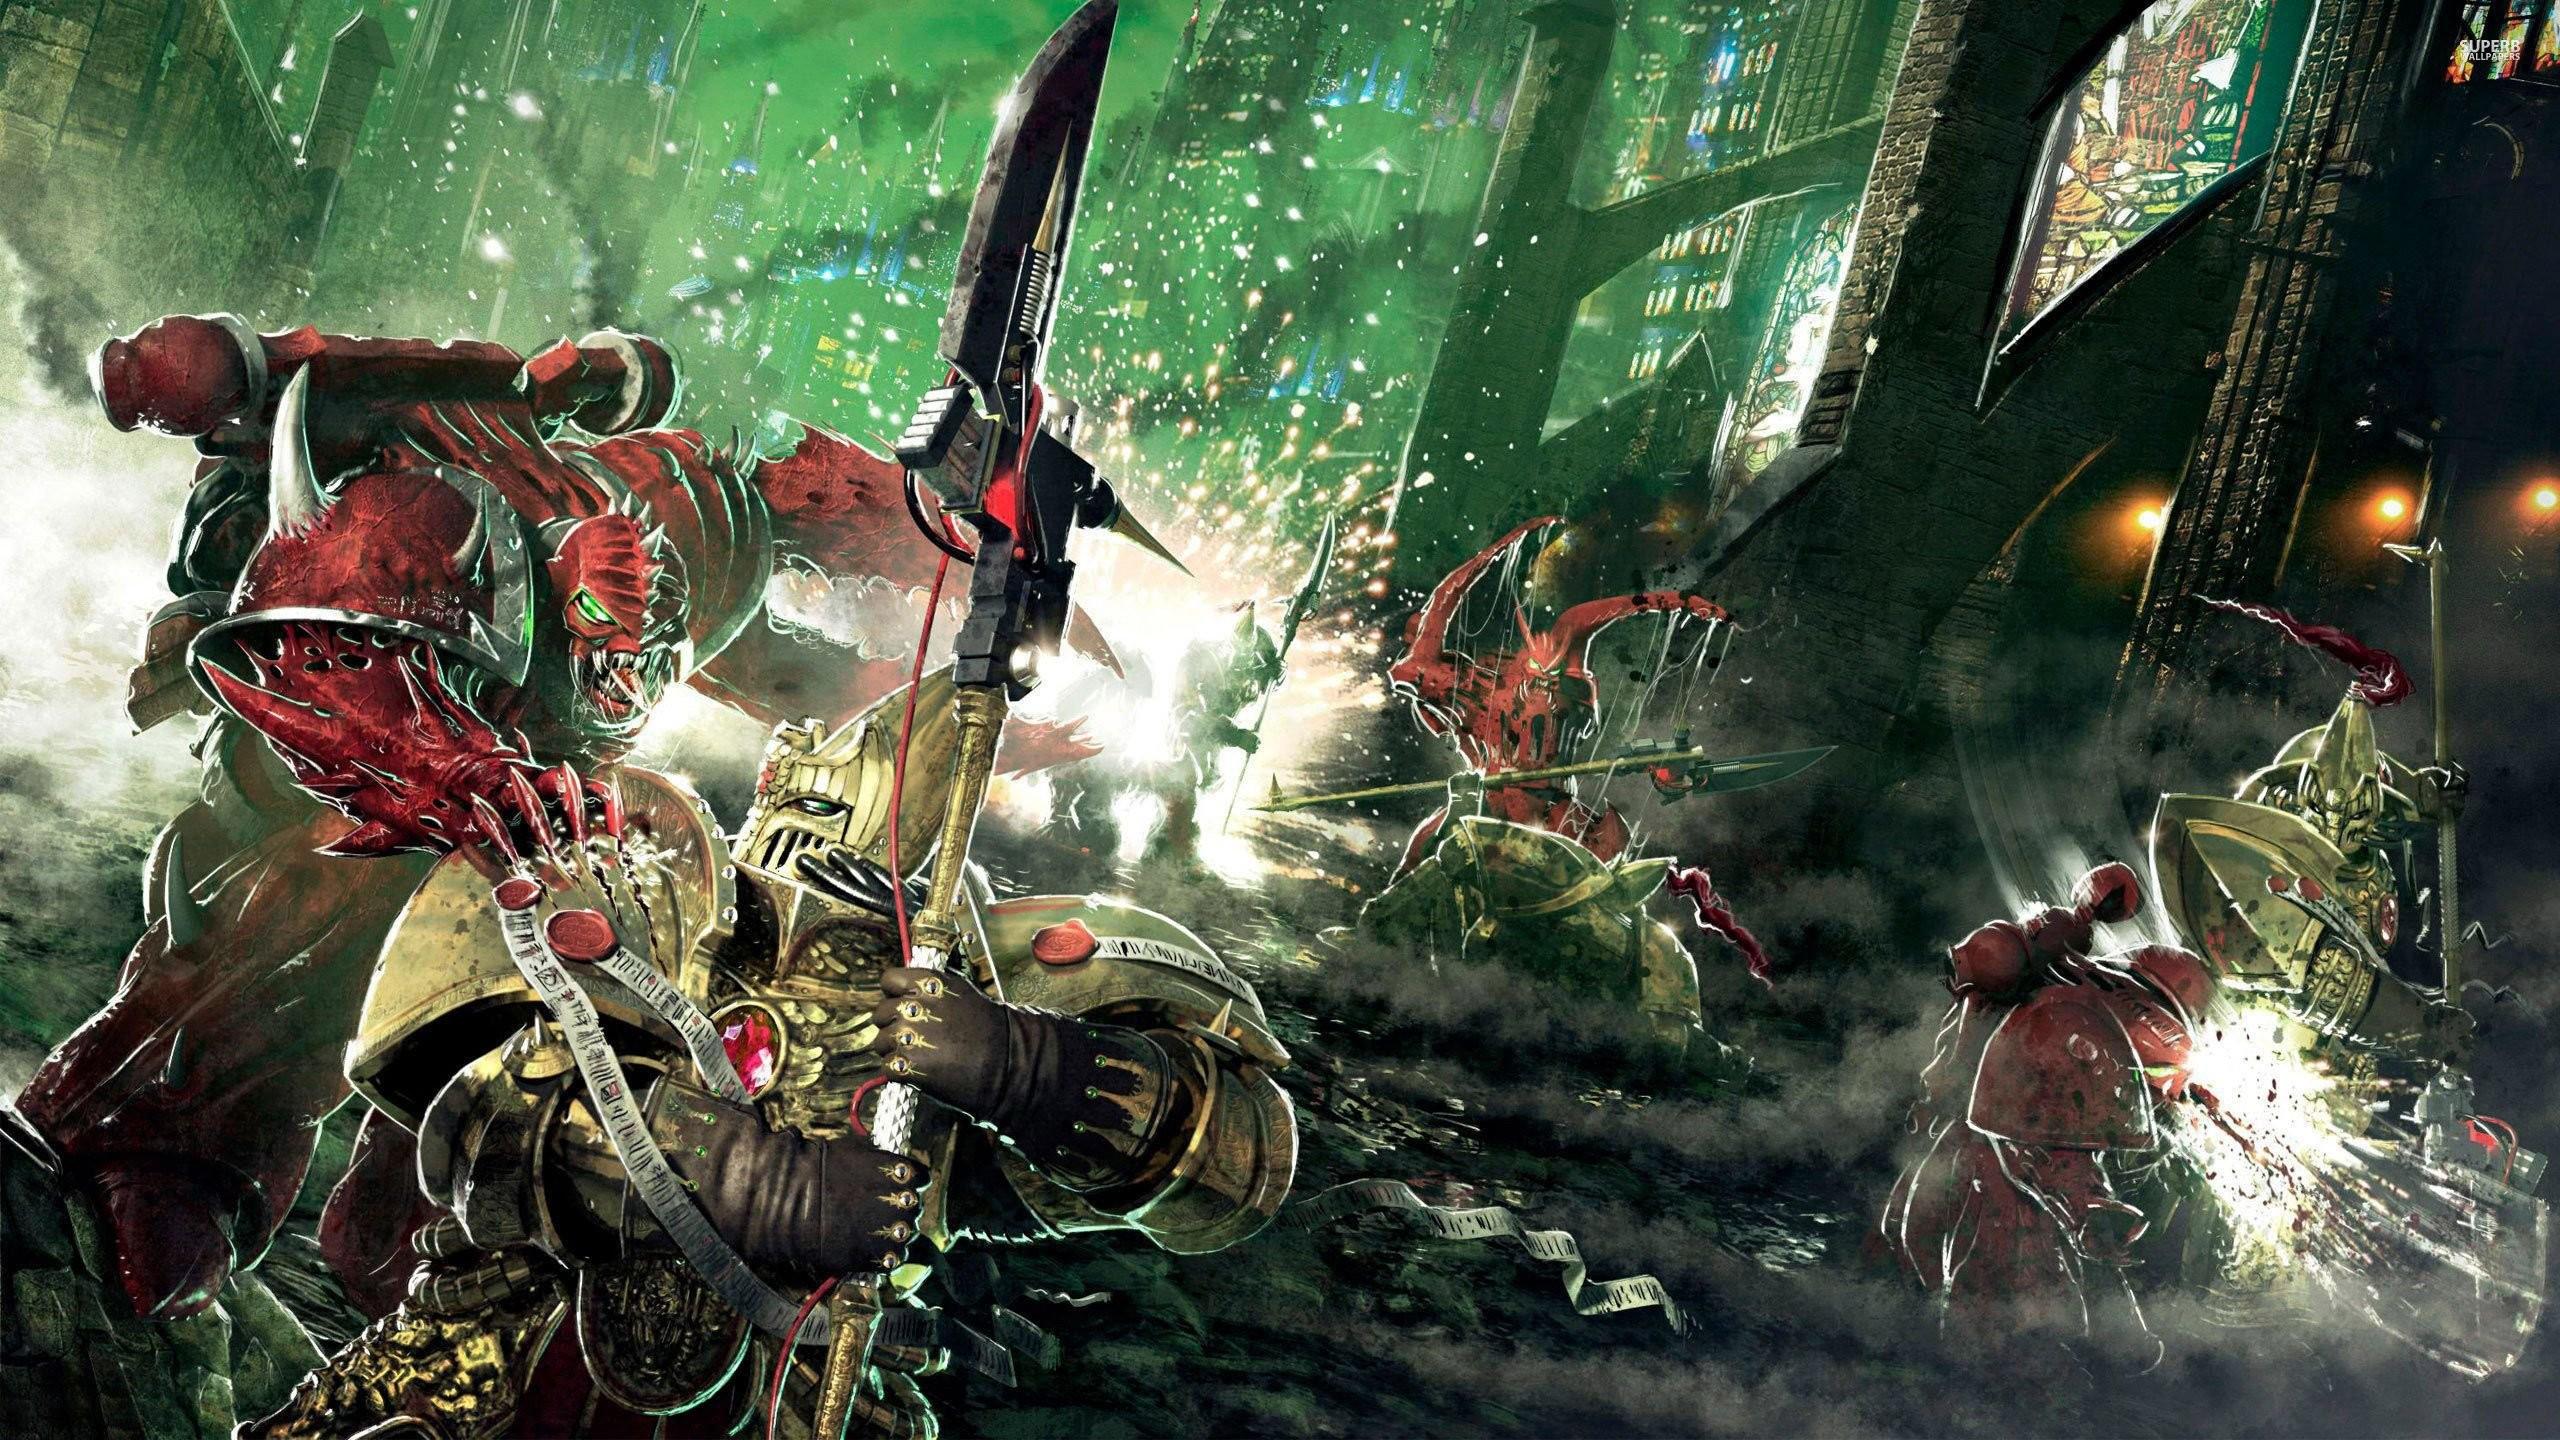 4035-horus-heresy-warhammer-warhammer-40k-warhammer-40000.